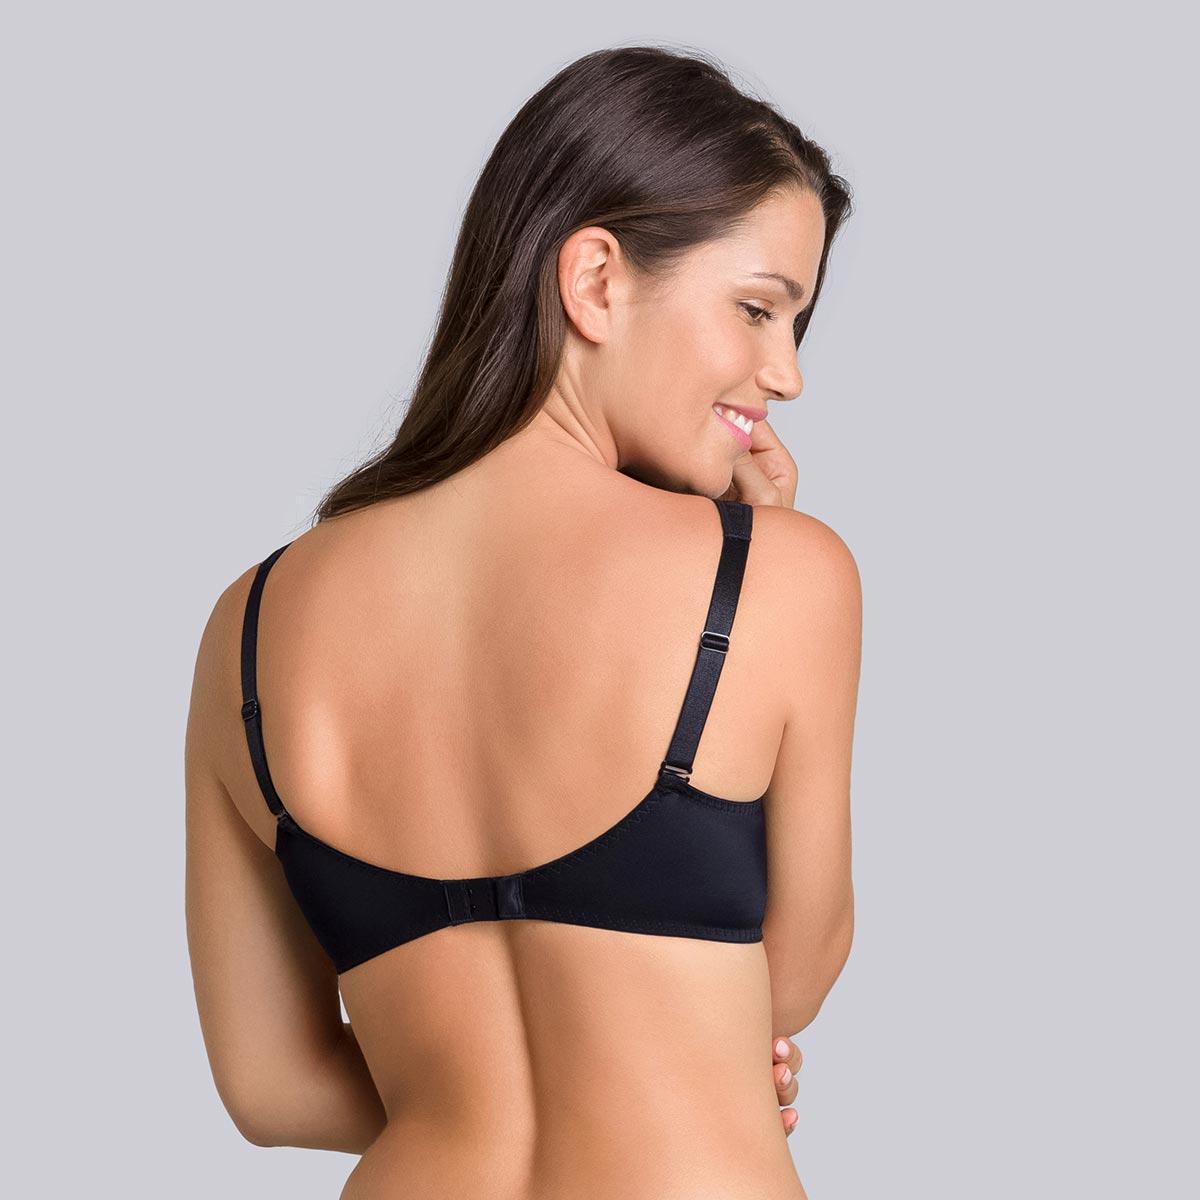 Underwired bra in black - Expert in Silhouette, , PLAYTEX